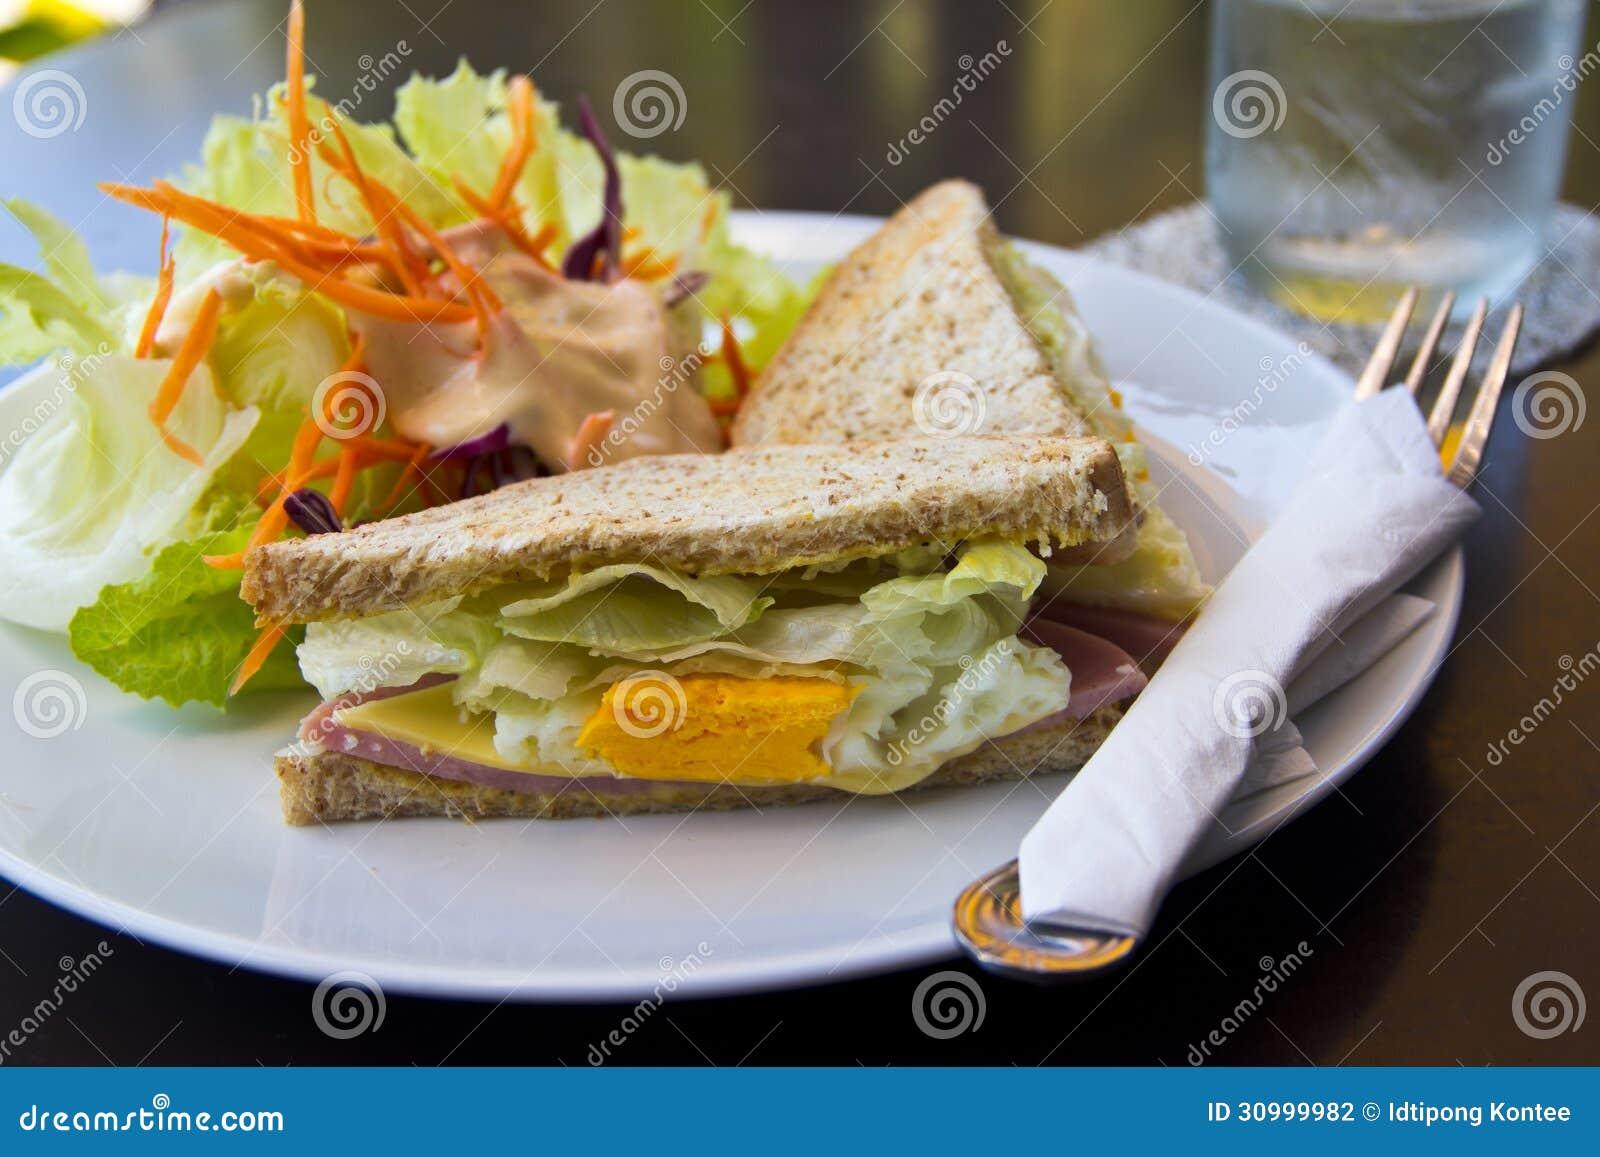 Breakfast,Club sandwich and salad